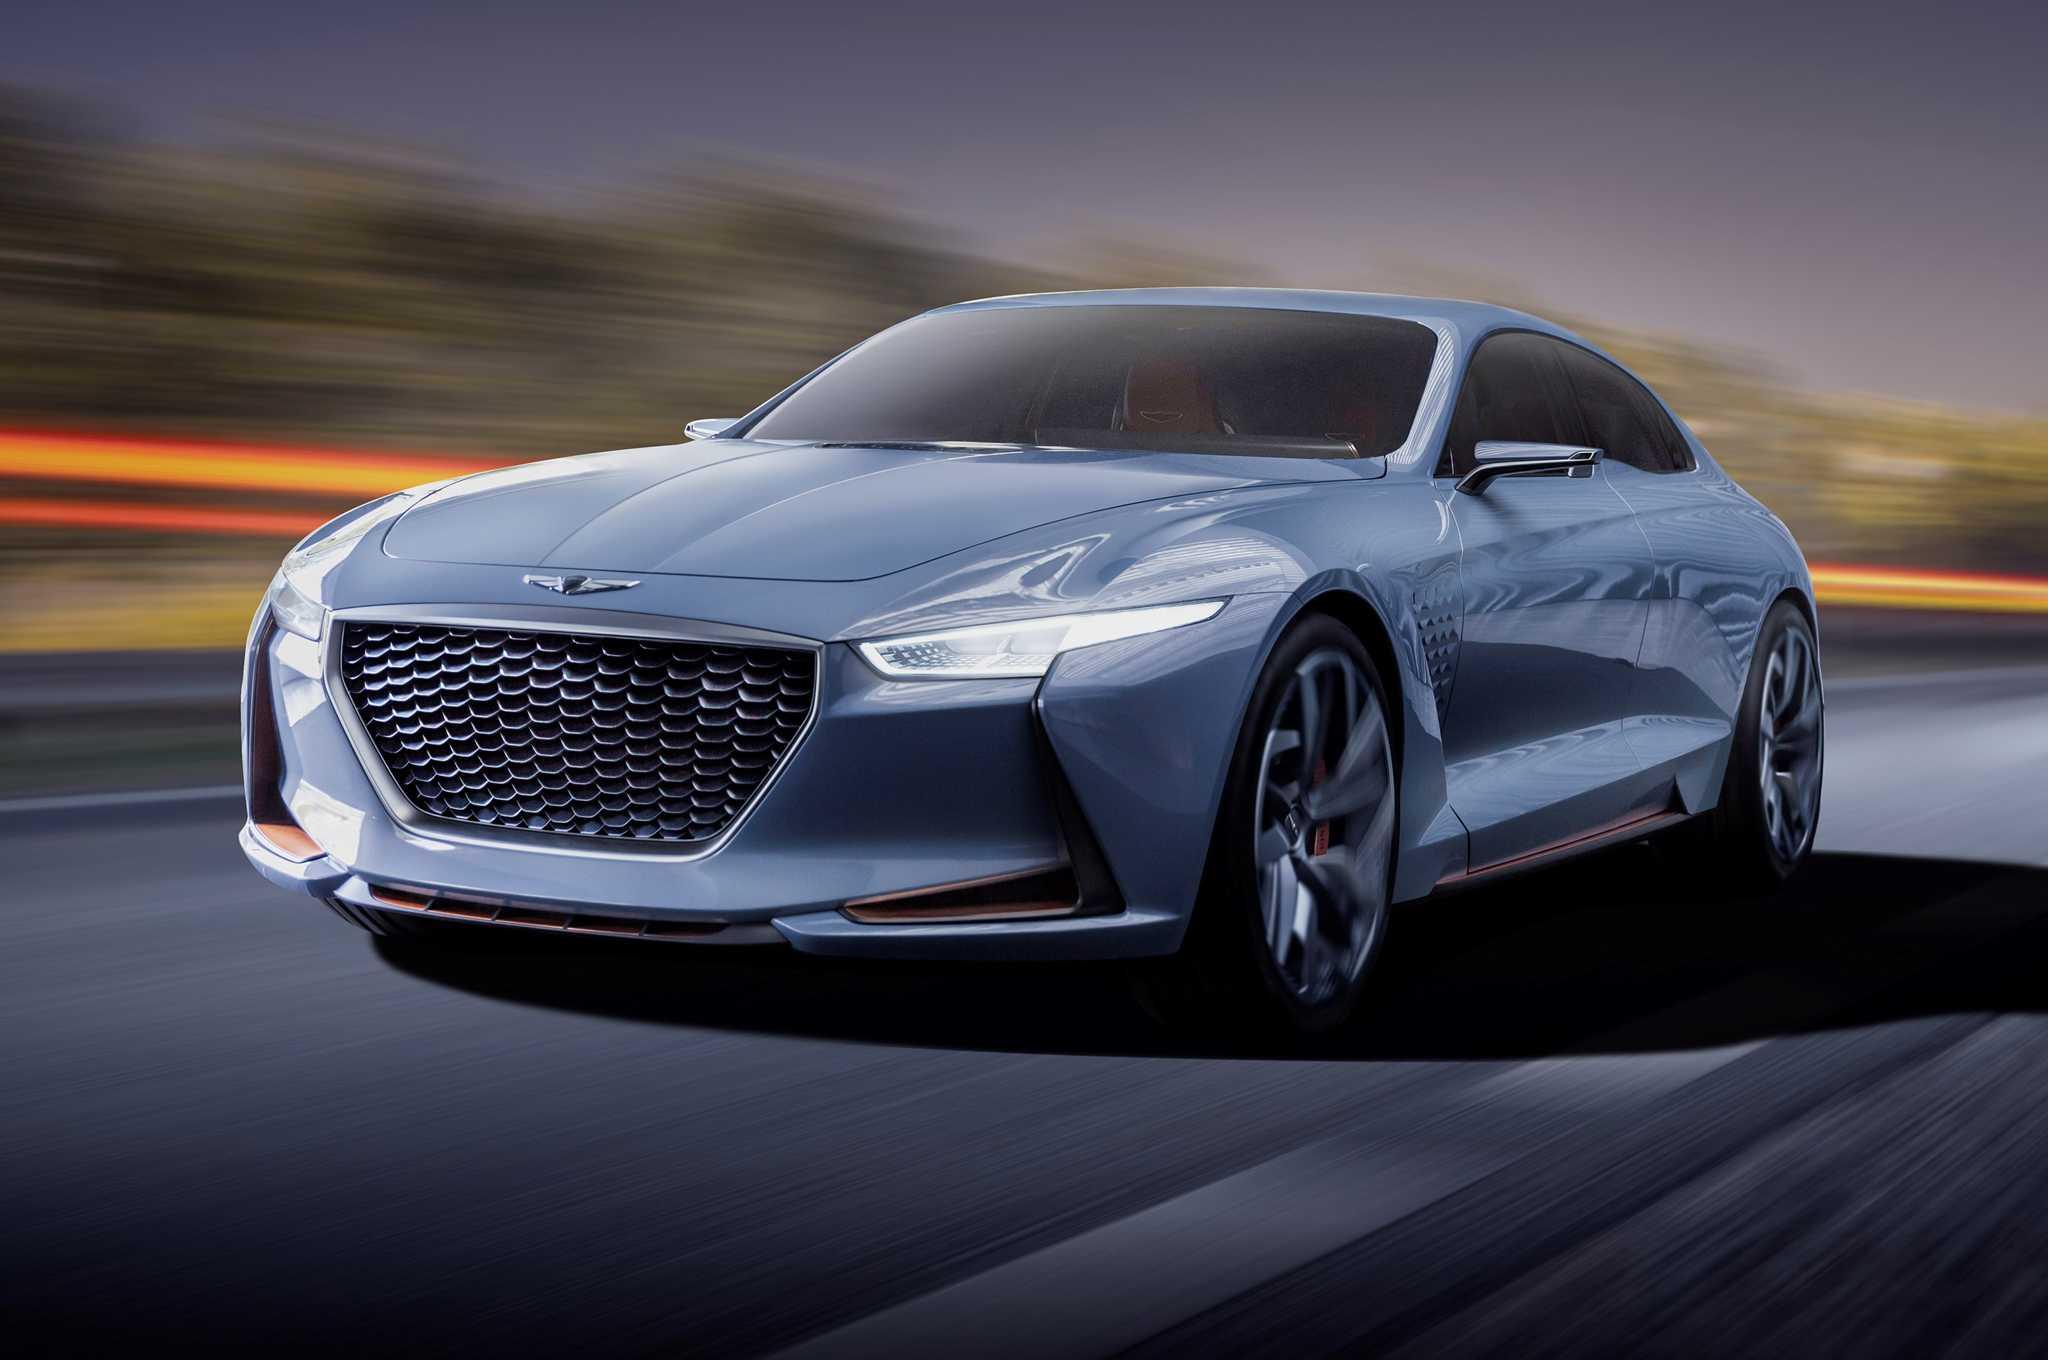 Hyundai May Introduce Luxury EV Under Genesis Brand